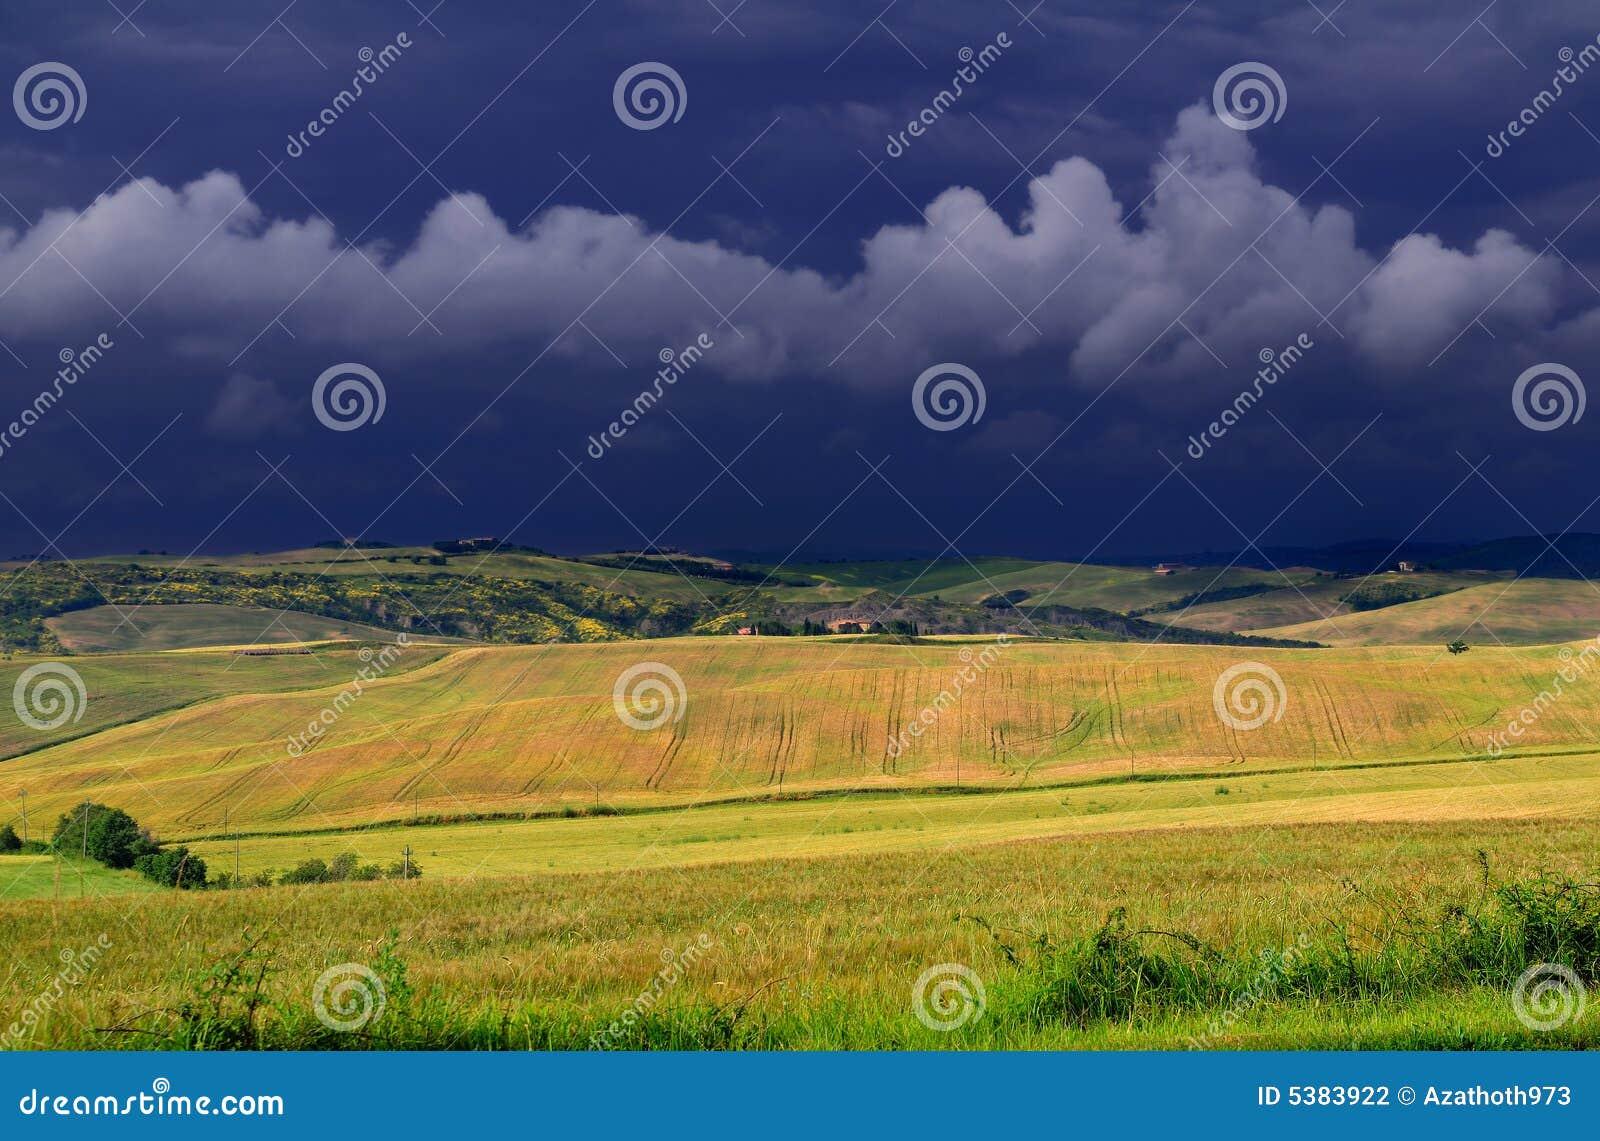 Tuscany june afternoon thunder